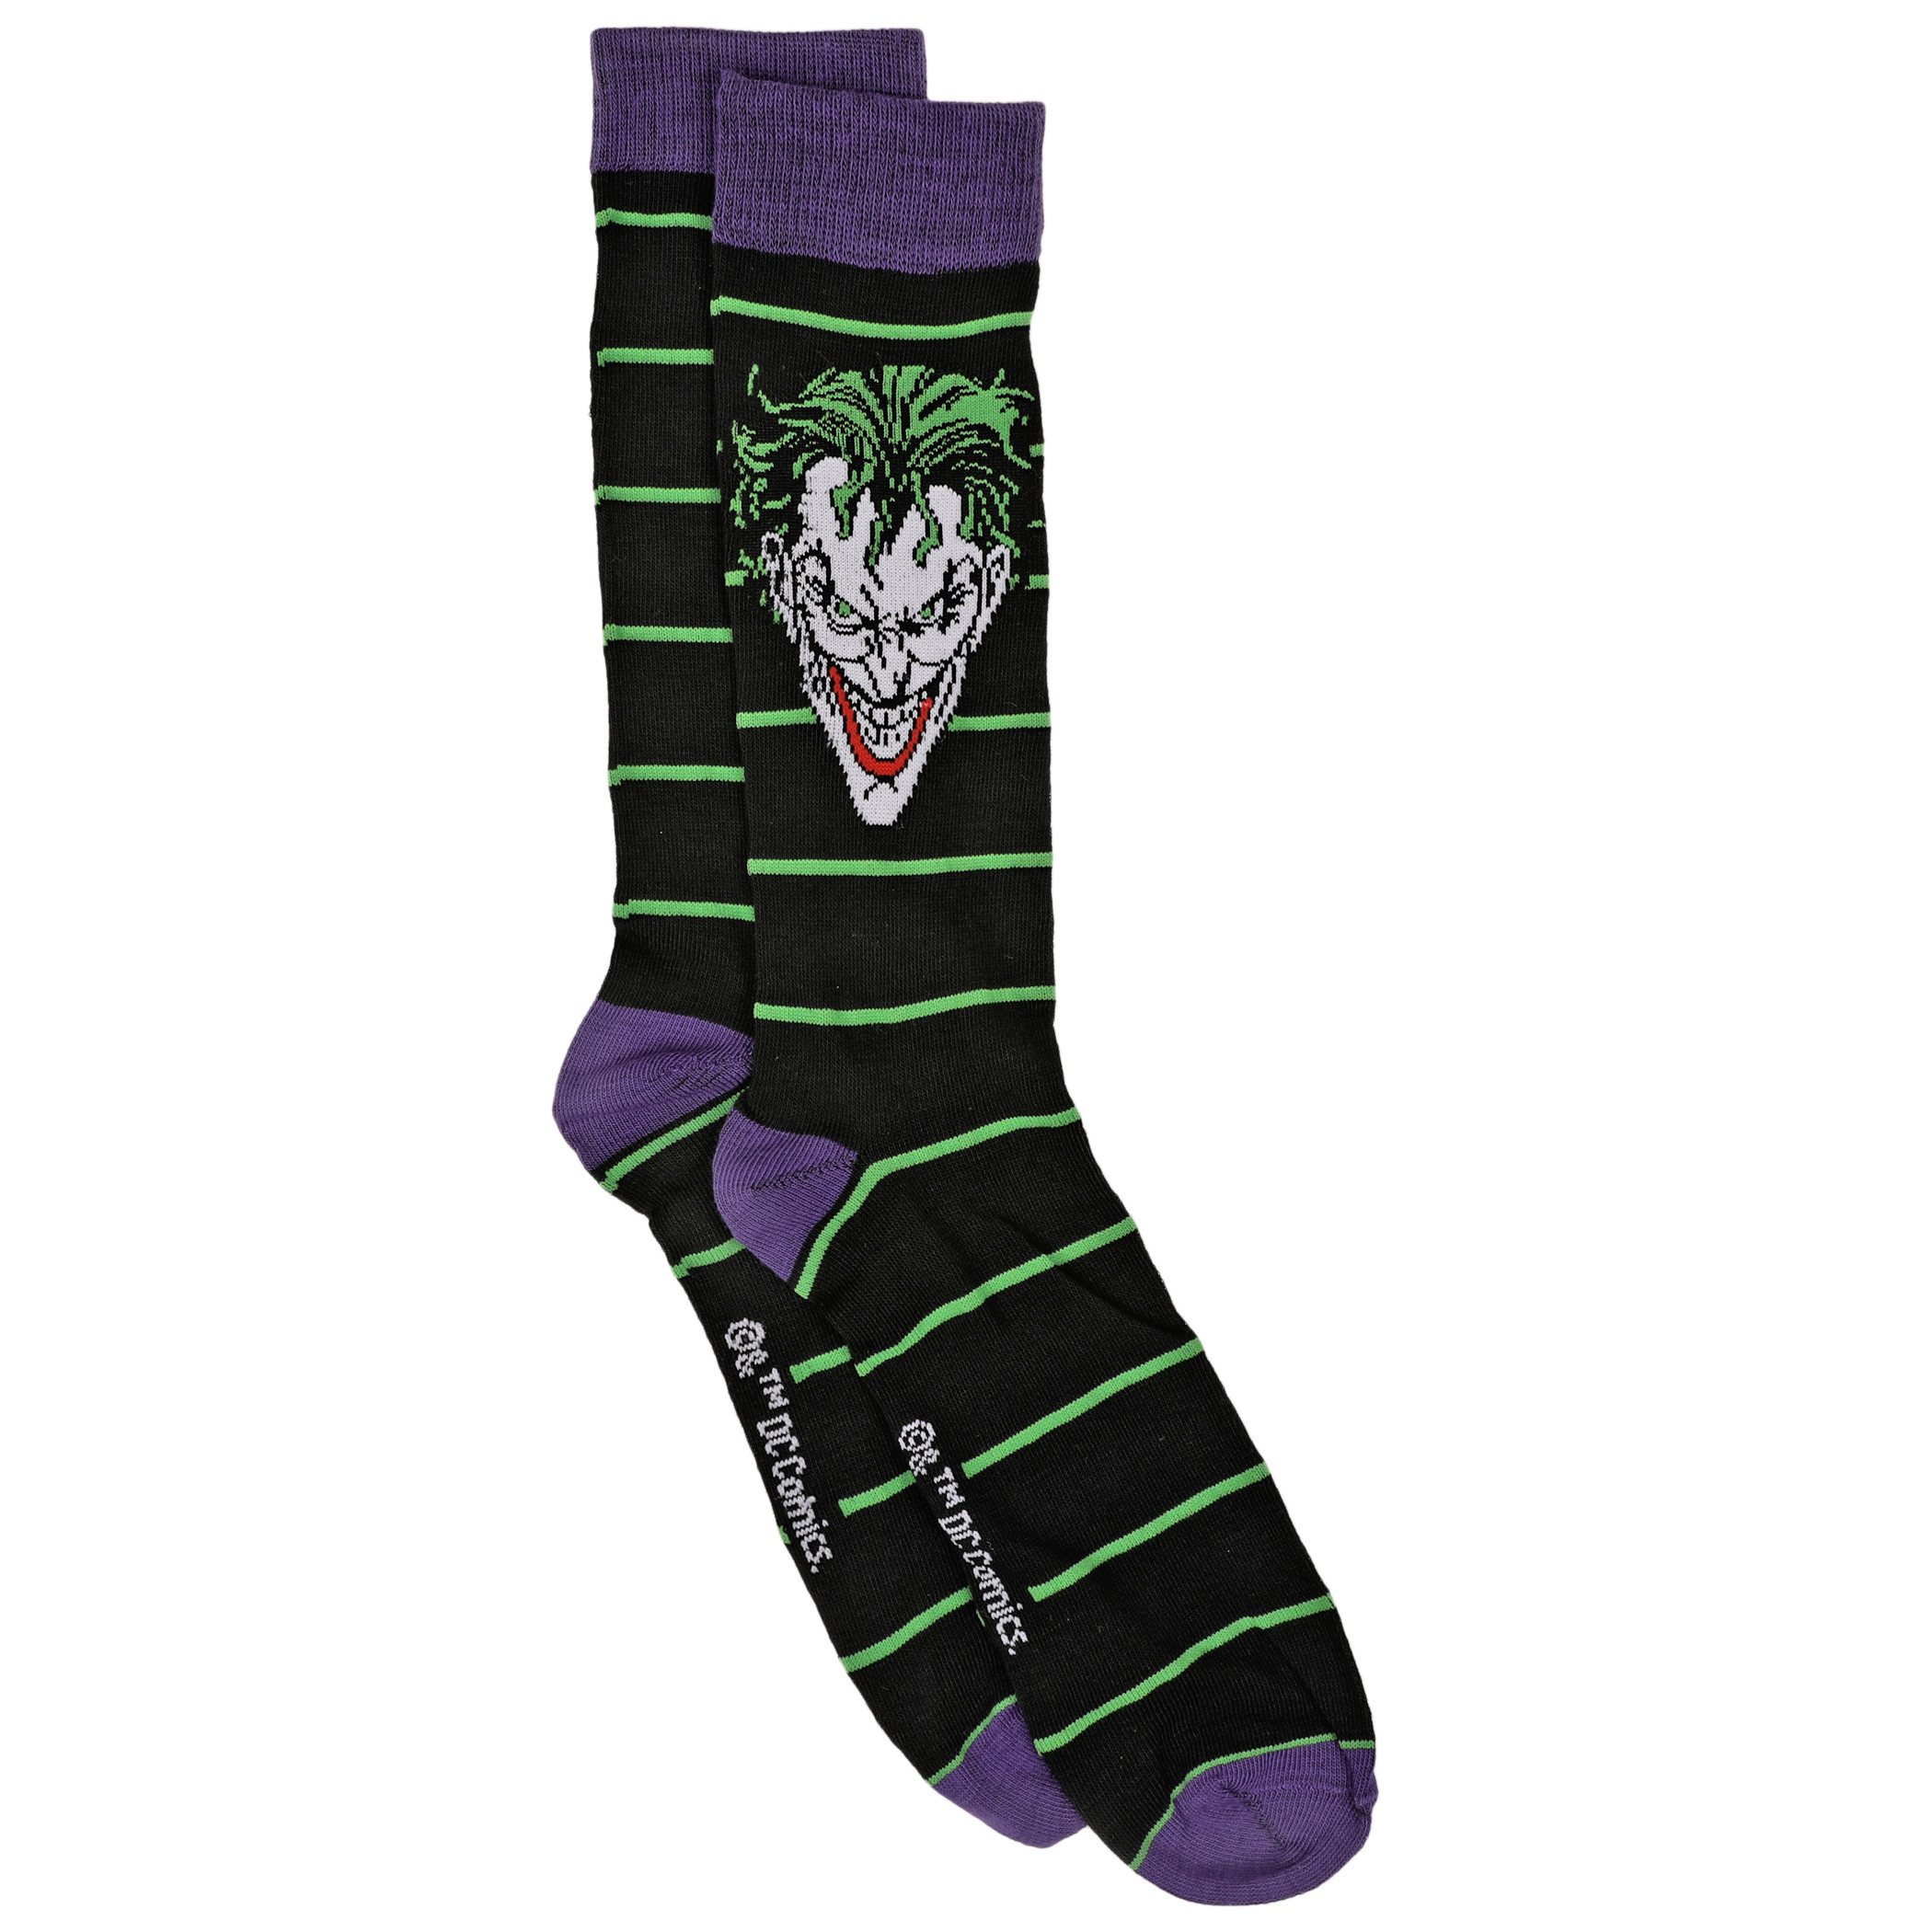 DC Villains The Joker 2-Pair Pack of Casual Crew Socks